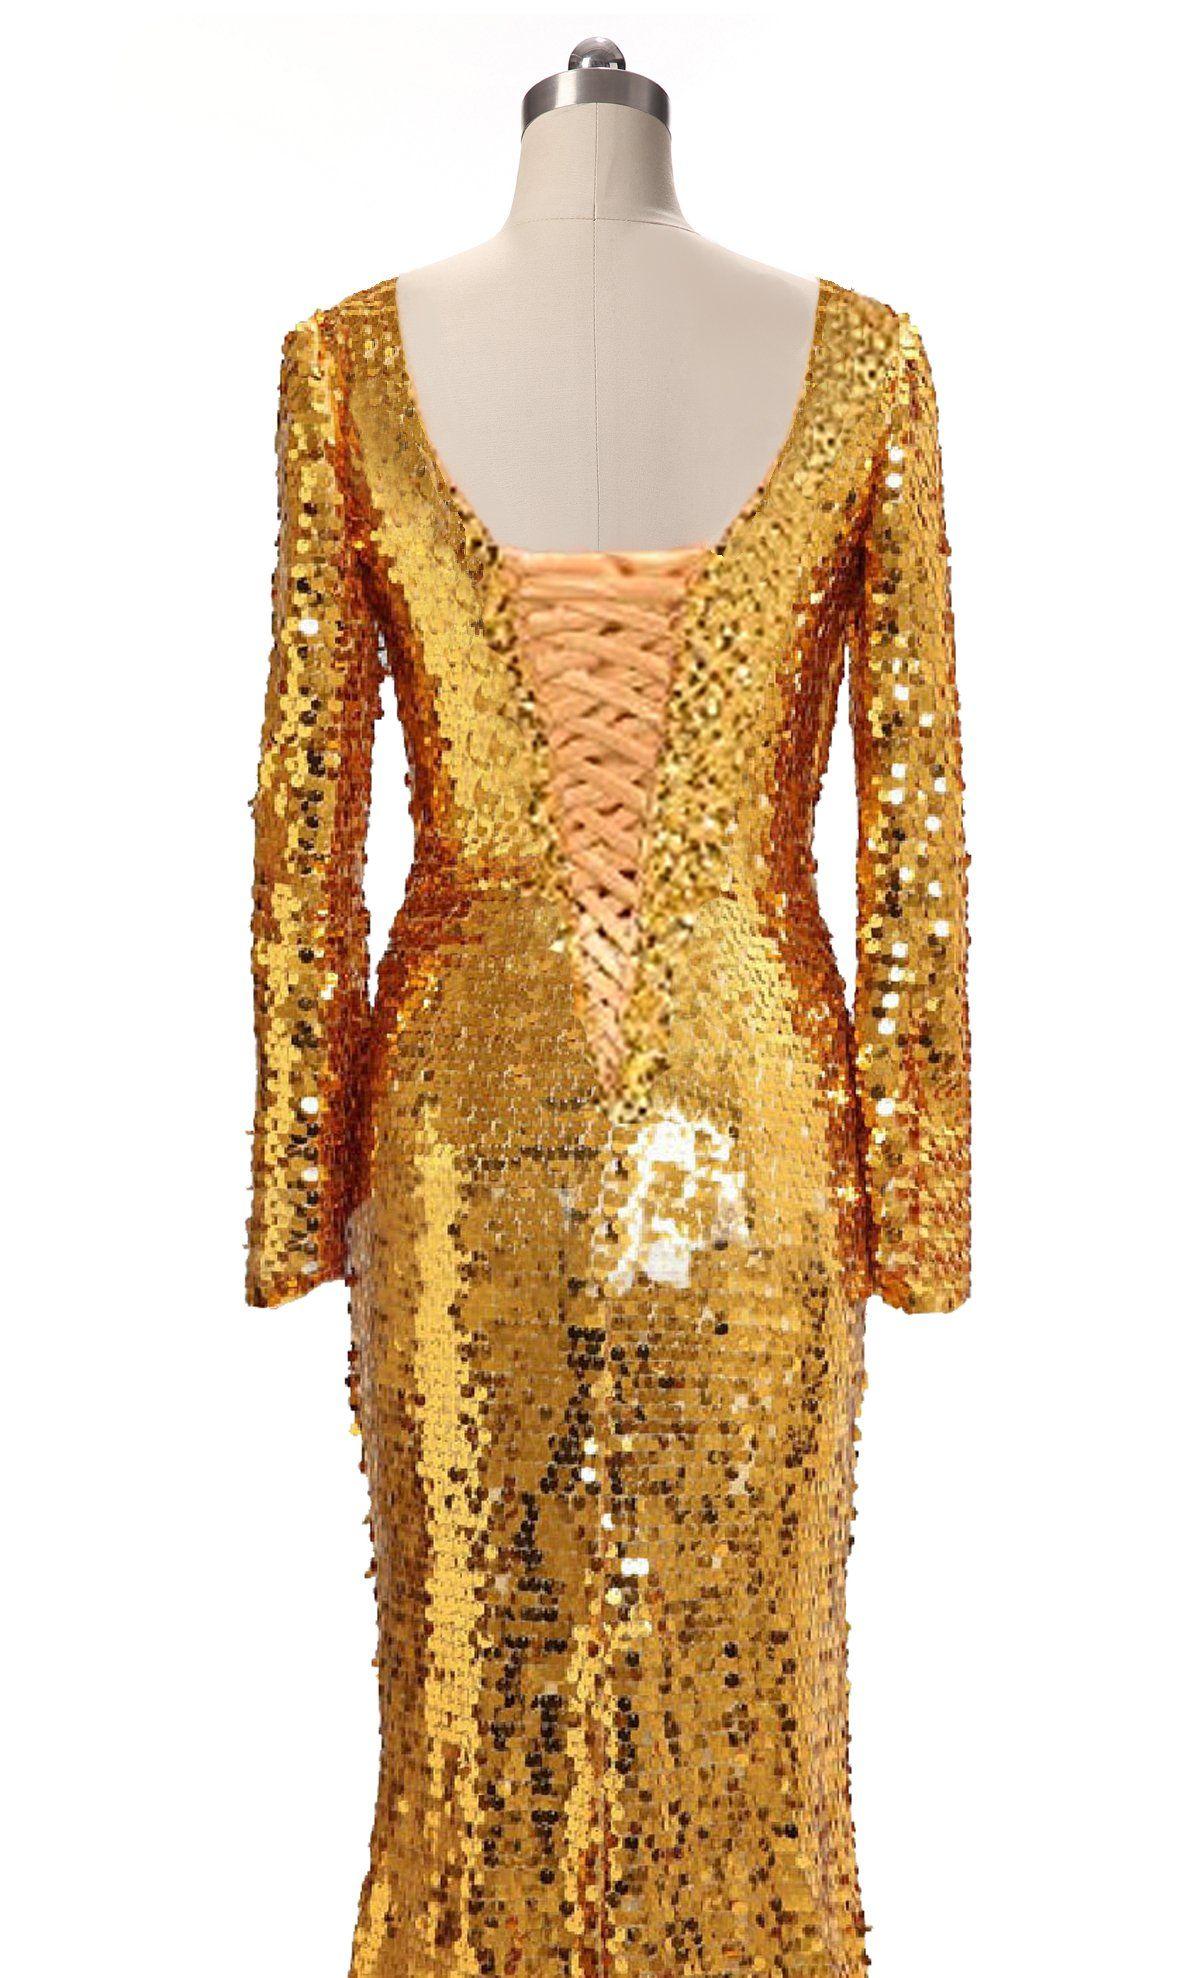 Jojobridal womens sequin long sleeves formal dresses deep v neck